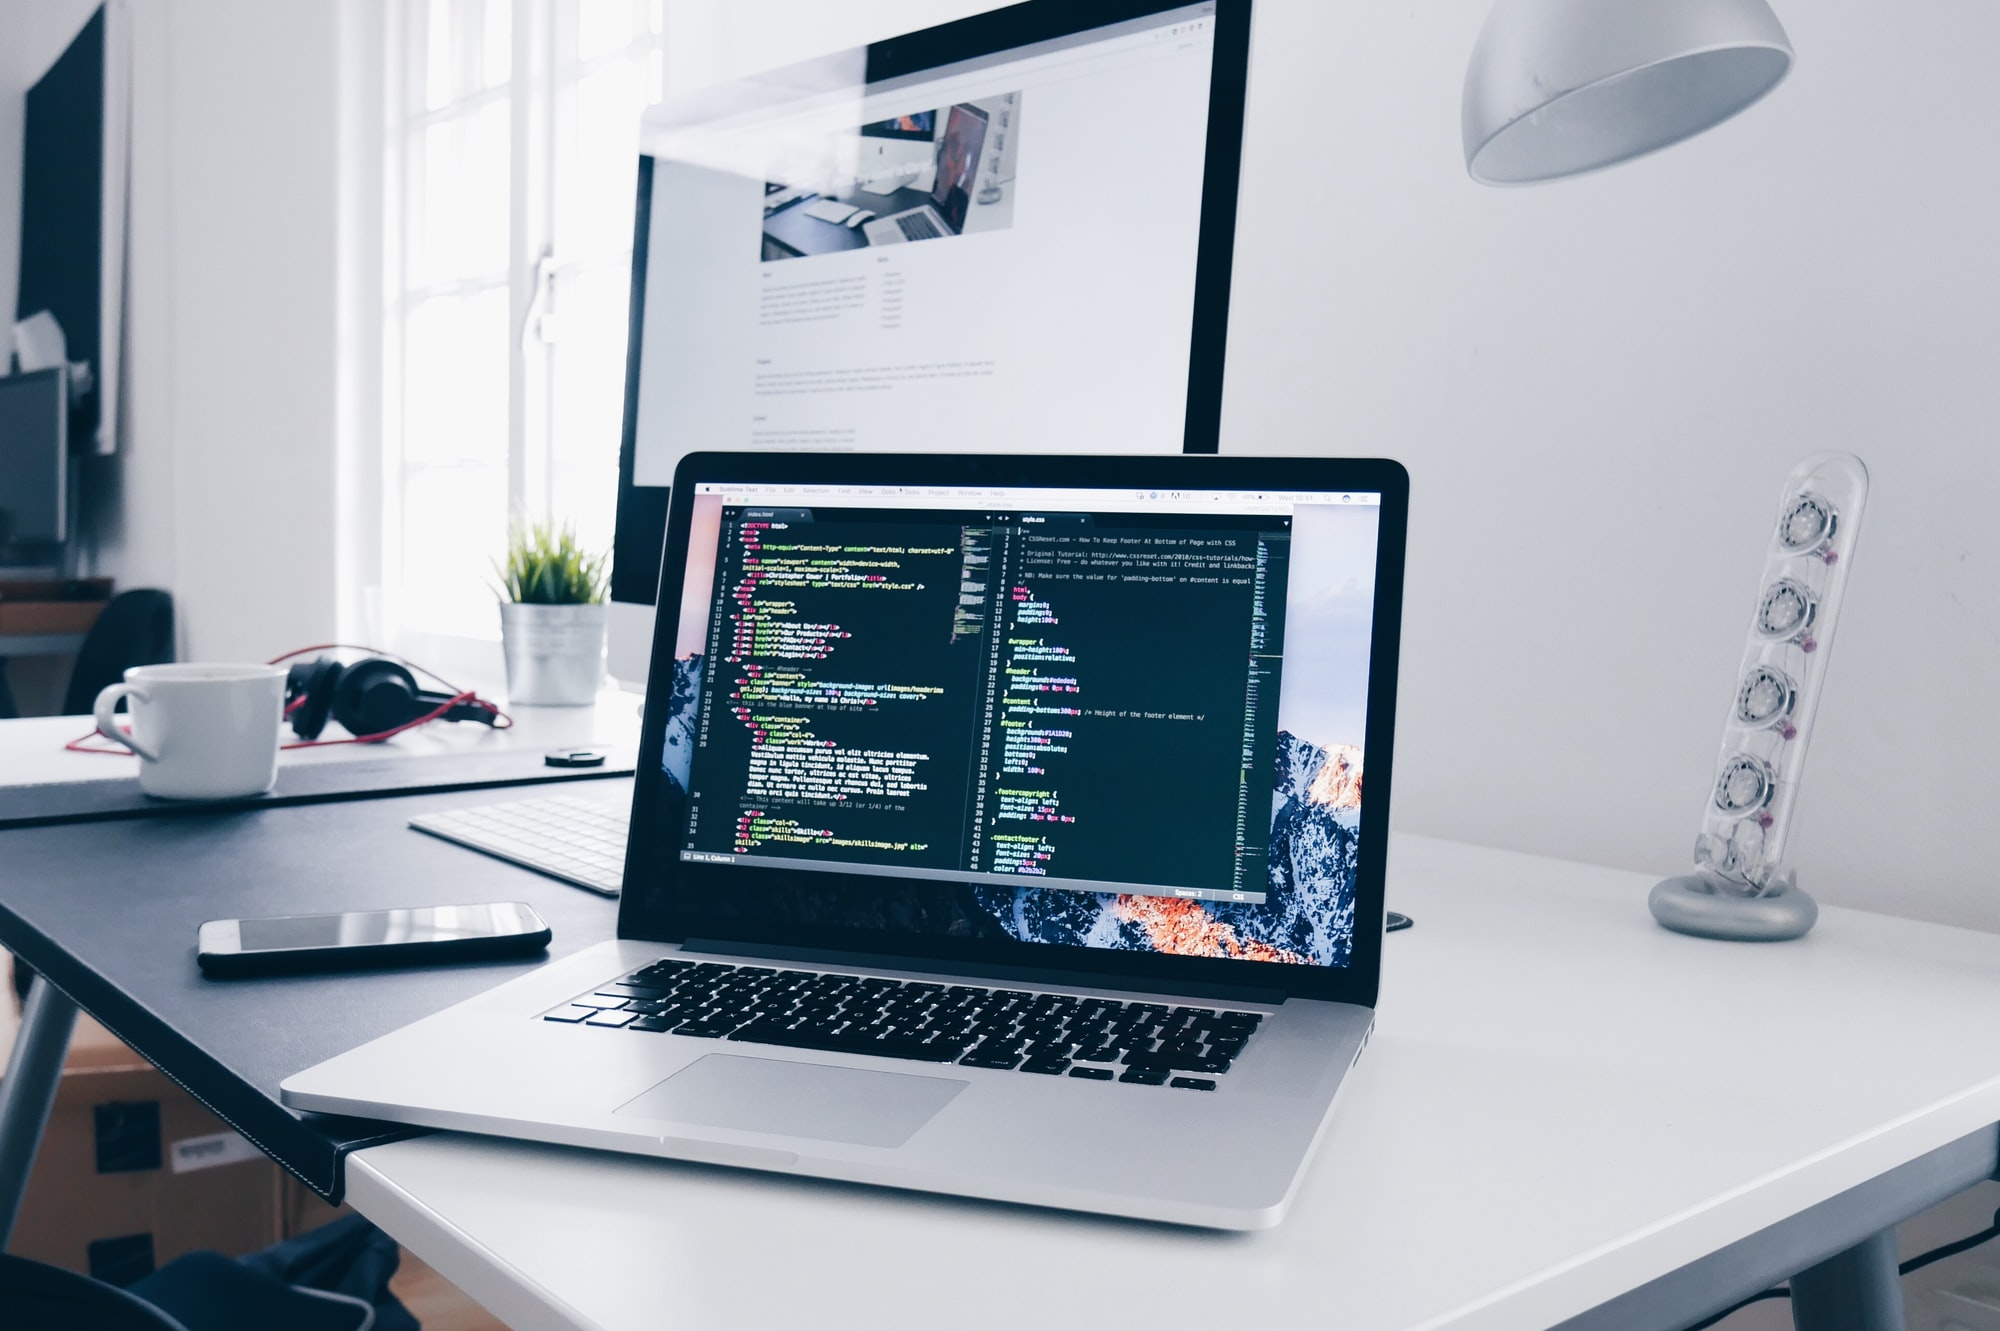 Should you learn Web Dev or Mobile Dev?